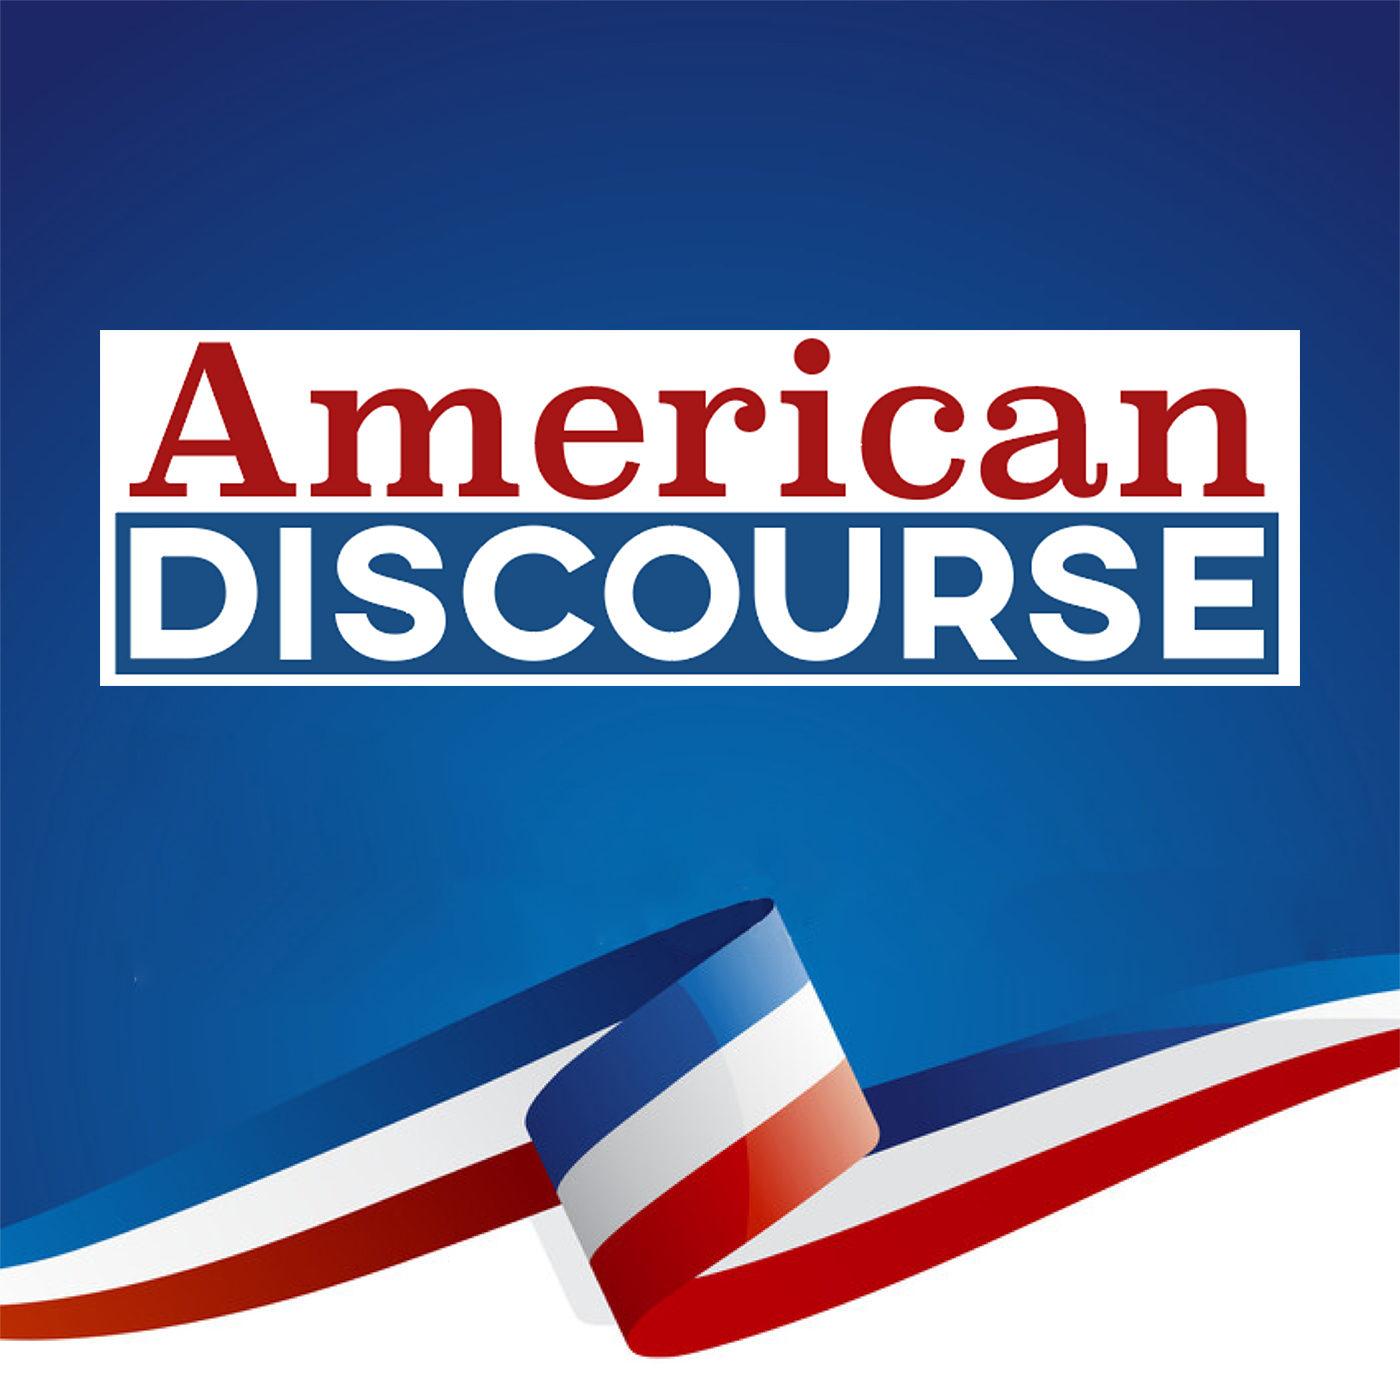 American Discourse